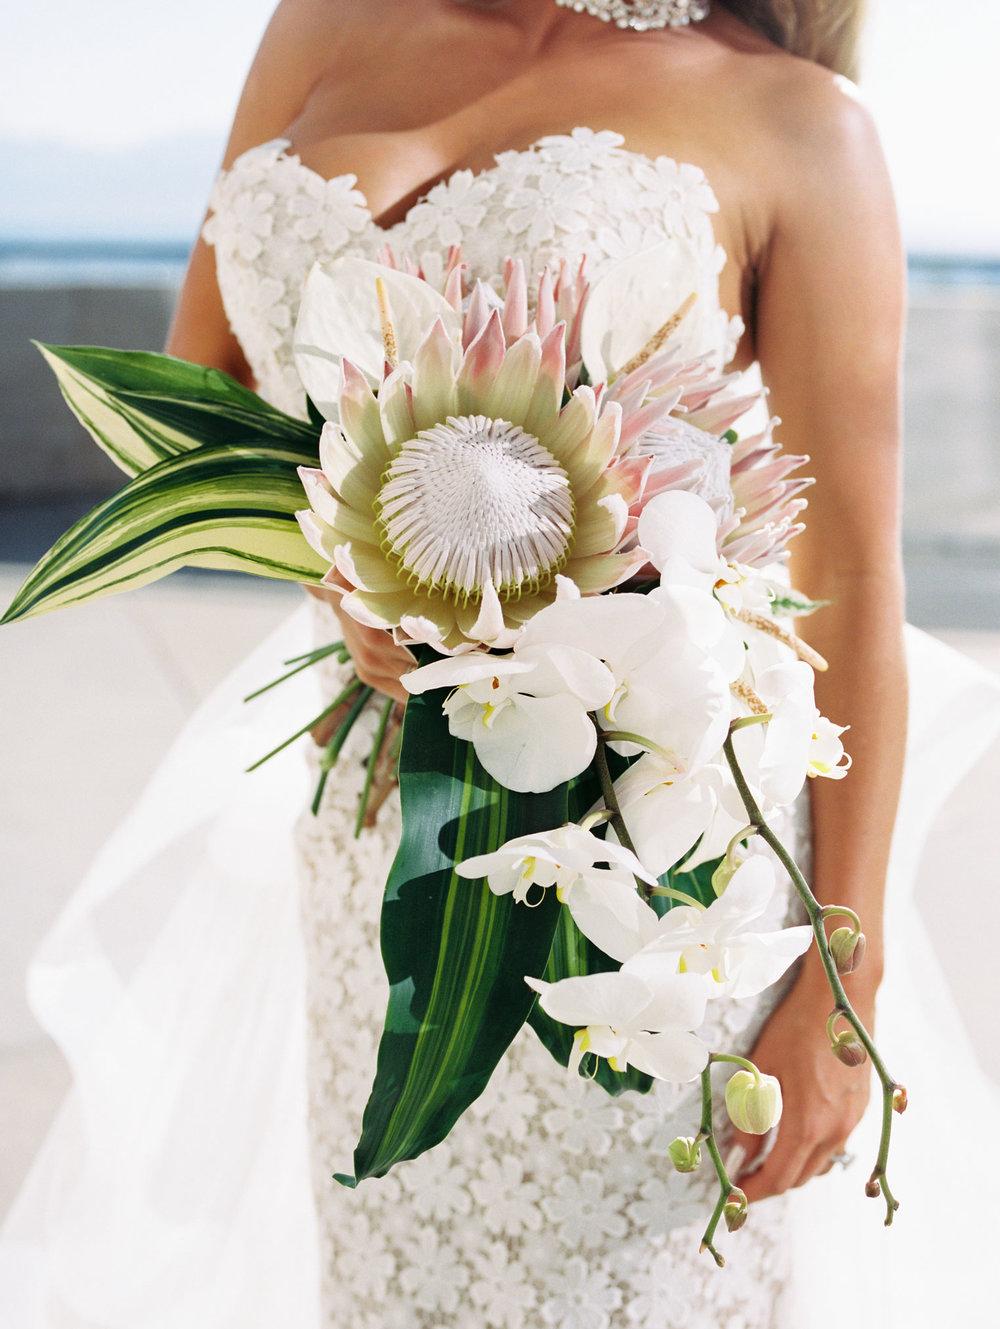 Tropical Bridal Bouquet in Salt Lake City